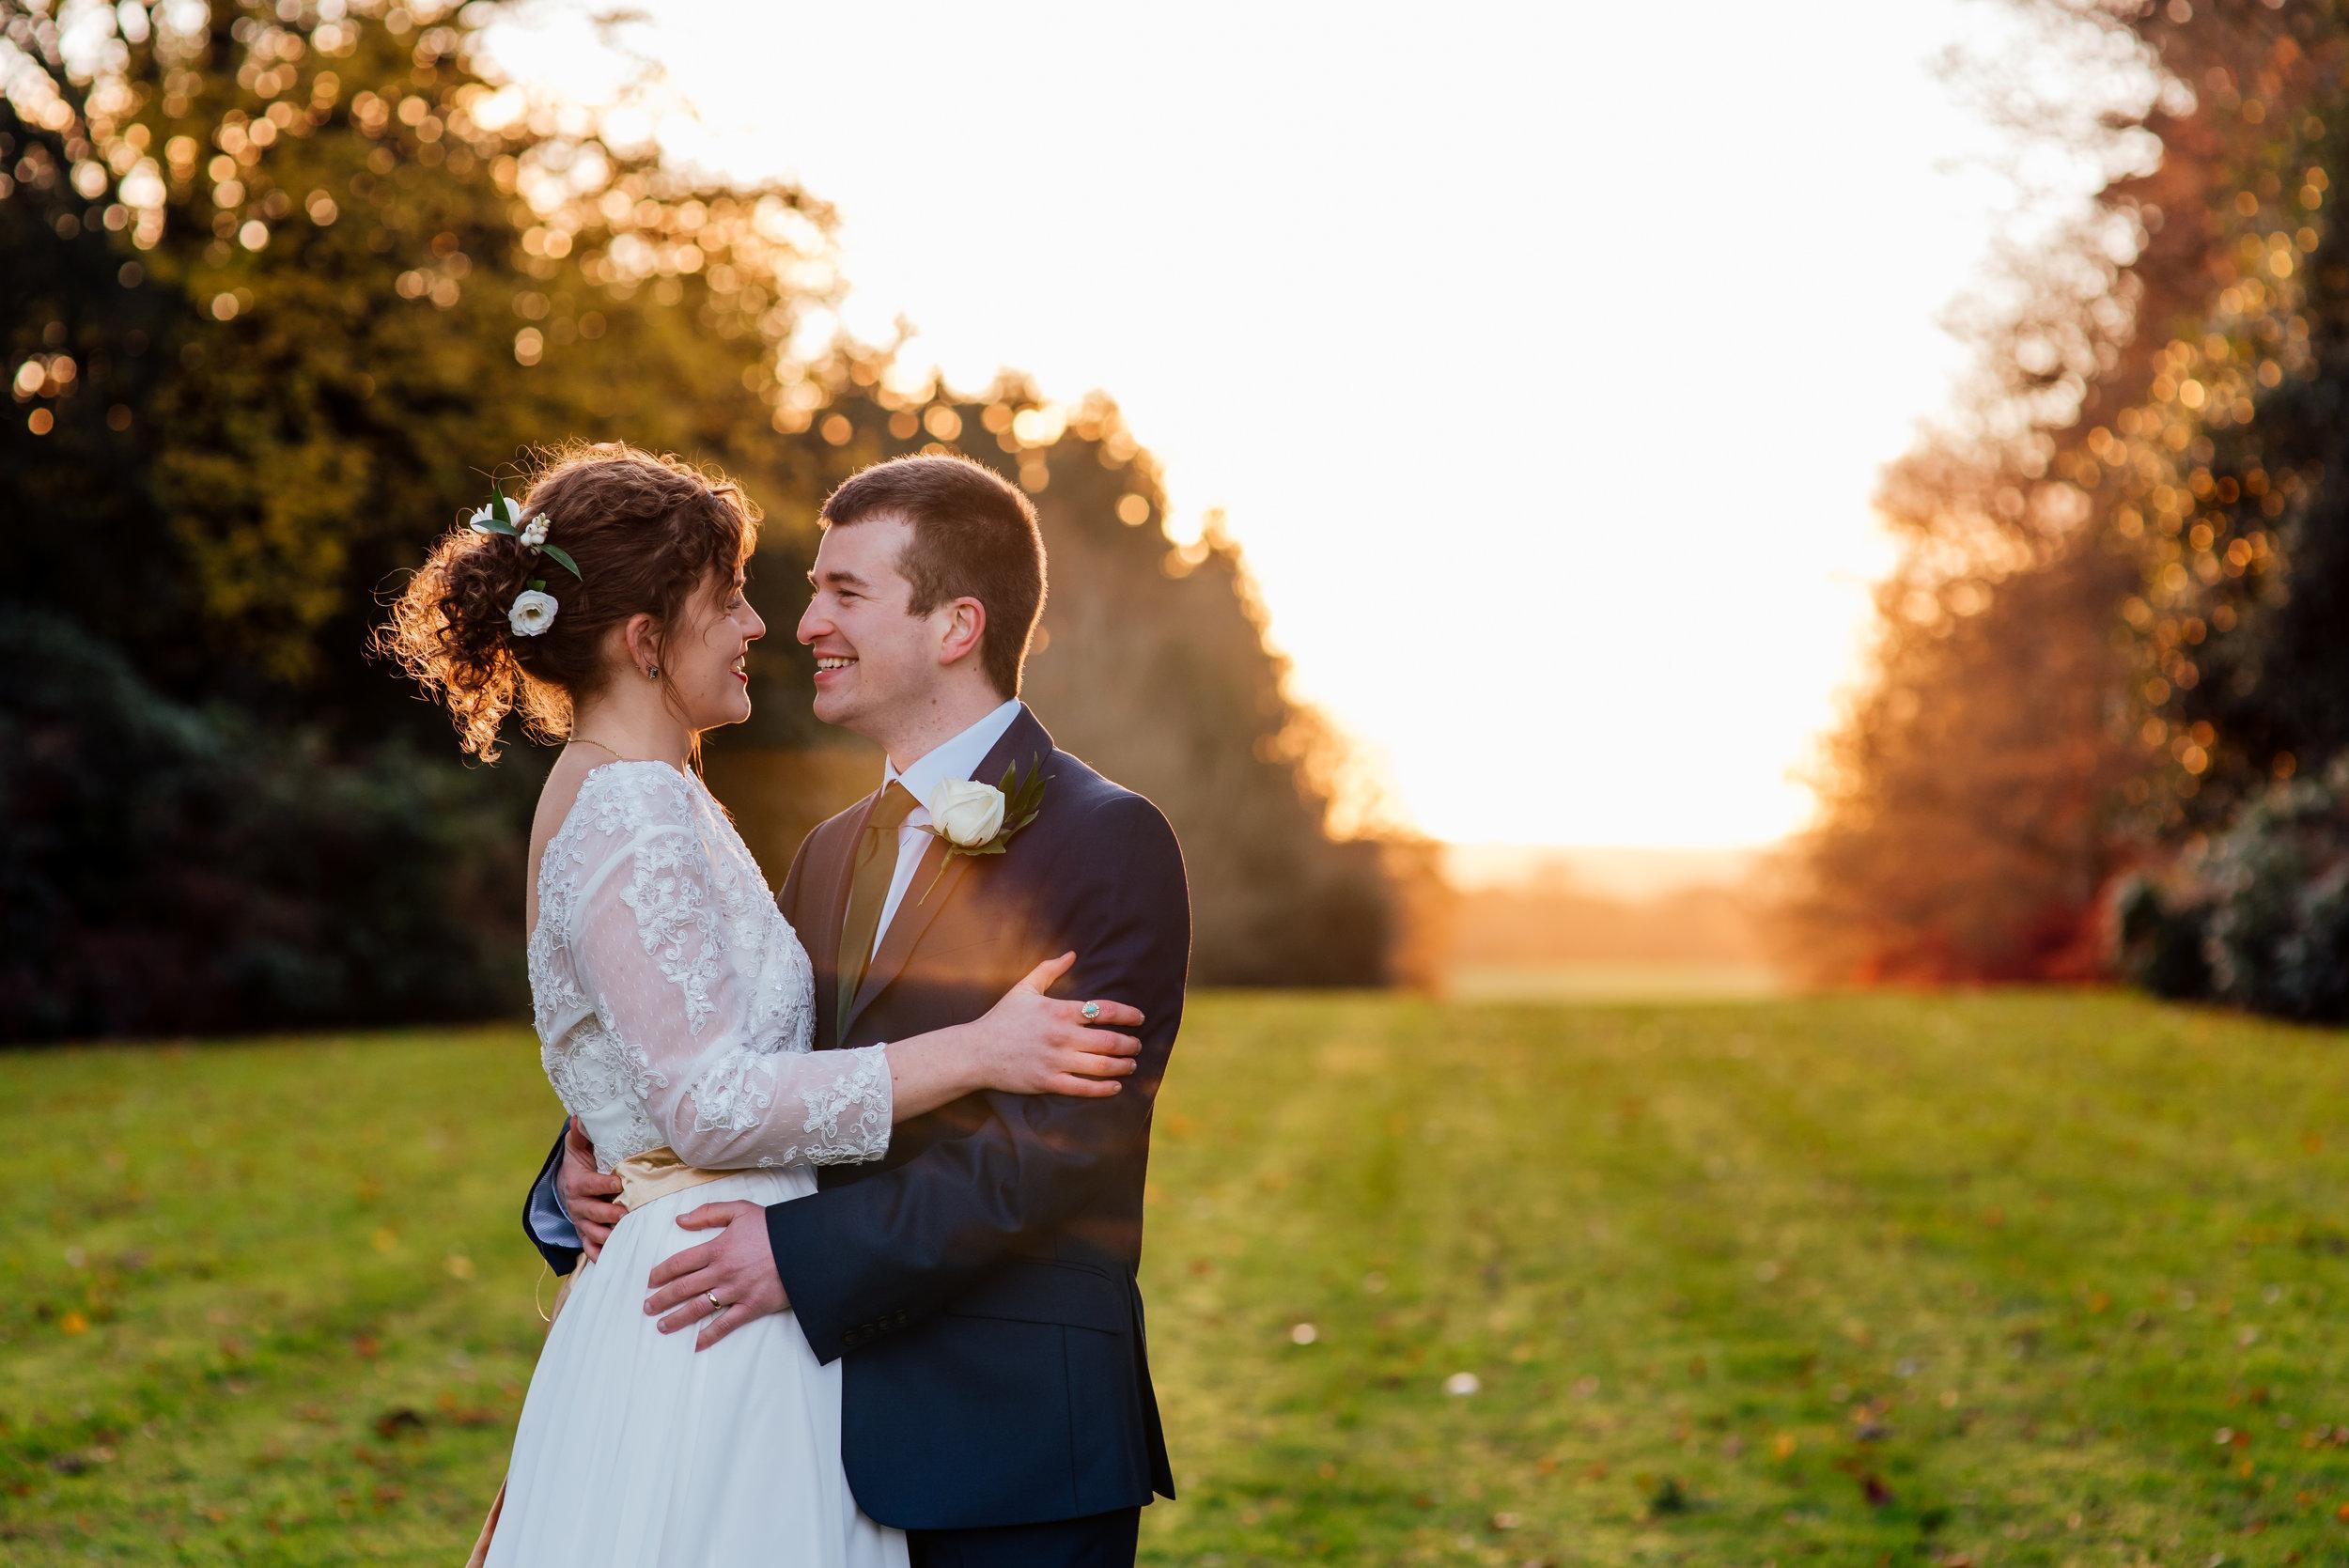 Hampshire-wedding-photographer-hampshire : Amy-James-Photography : Tylney-Hall-Wedding : Tyleny-Hall-Wedding-Photographer : Hampshire-wedding-venue : Fleet-wedding-photographer-farnborough-538.jpg